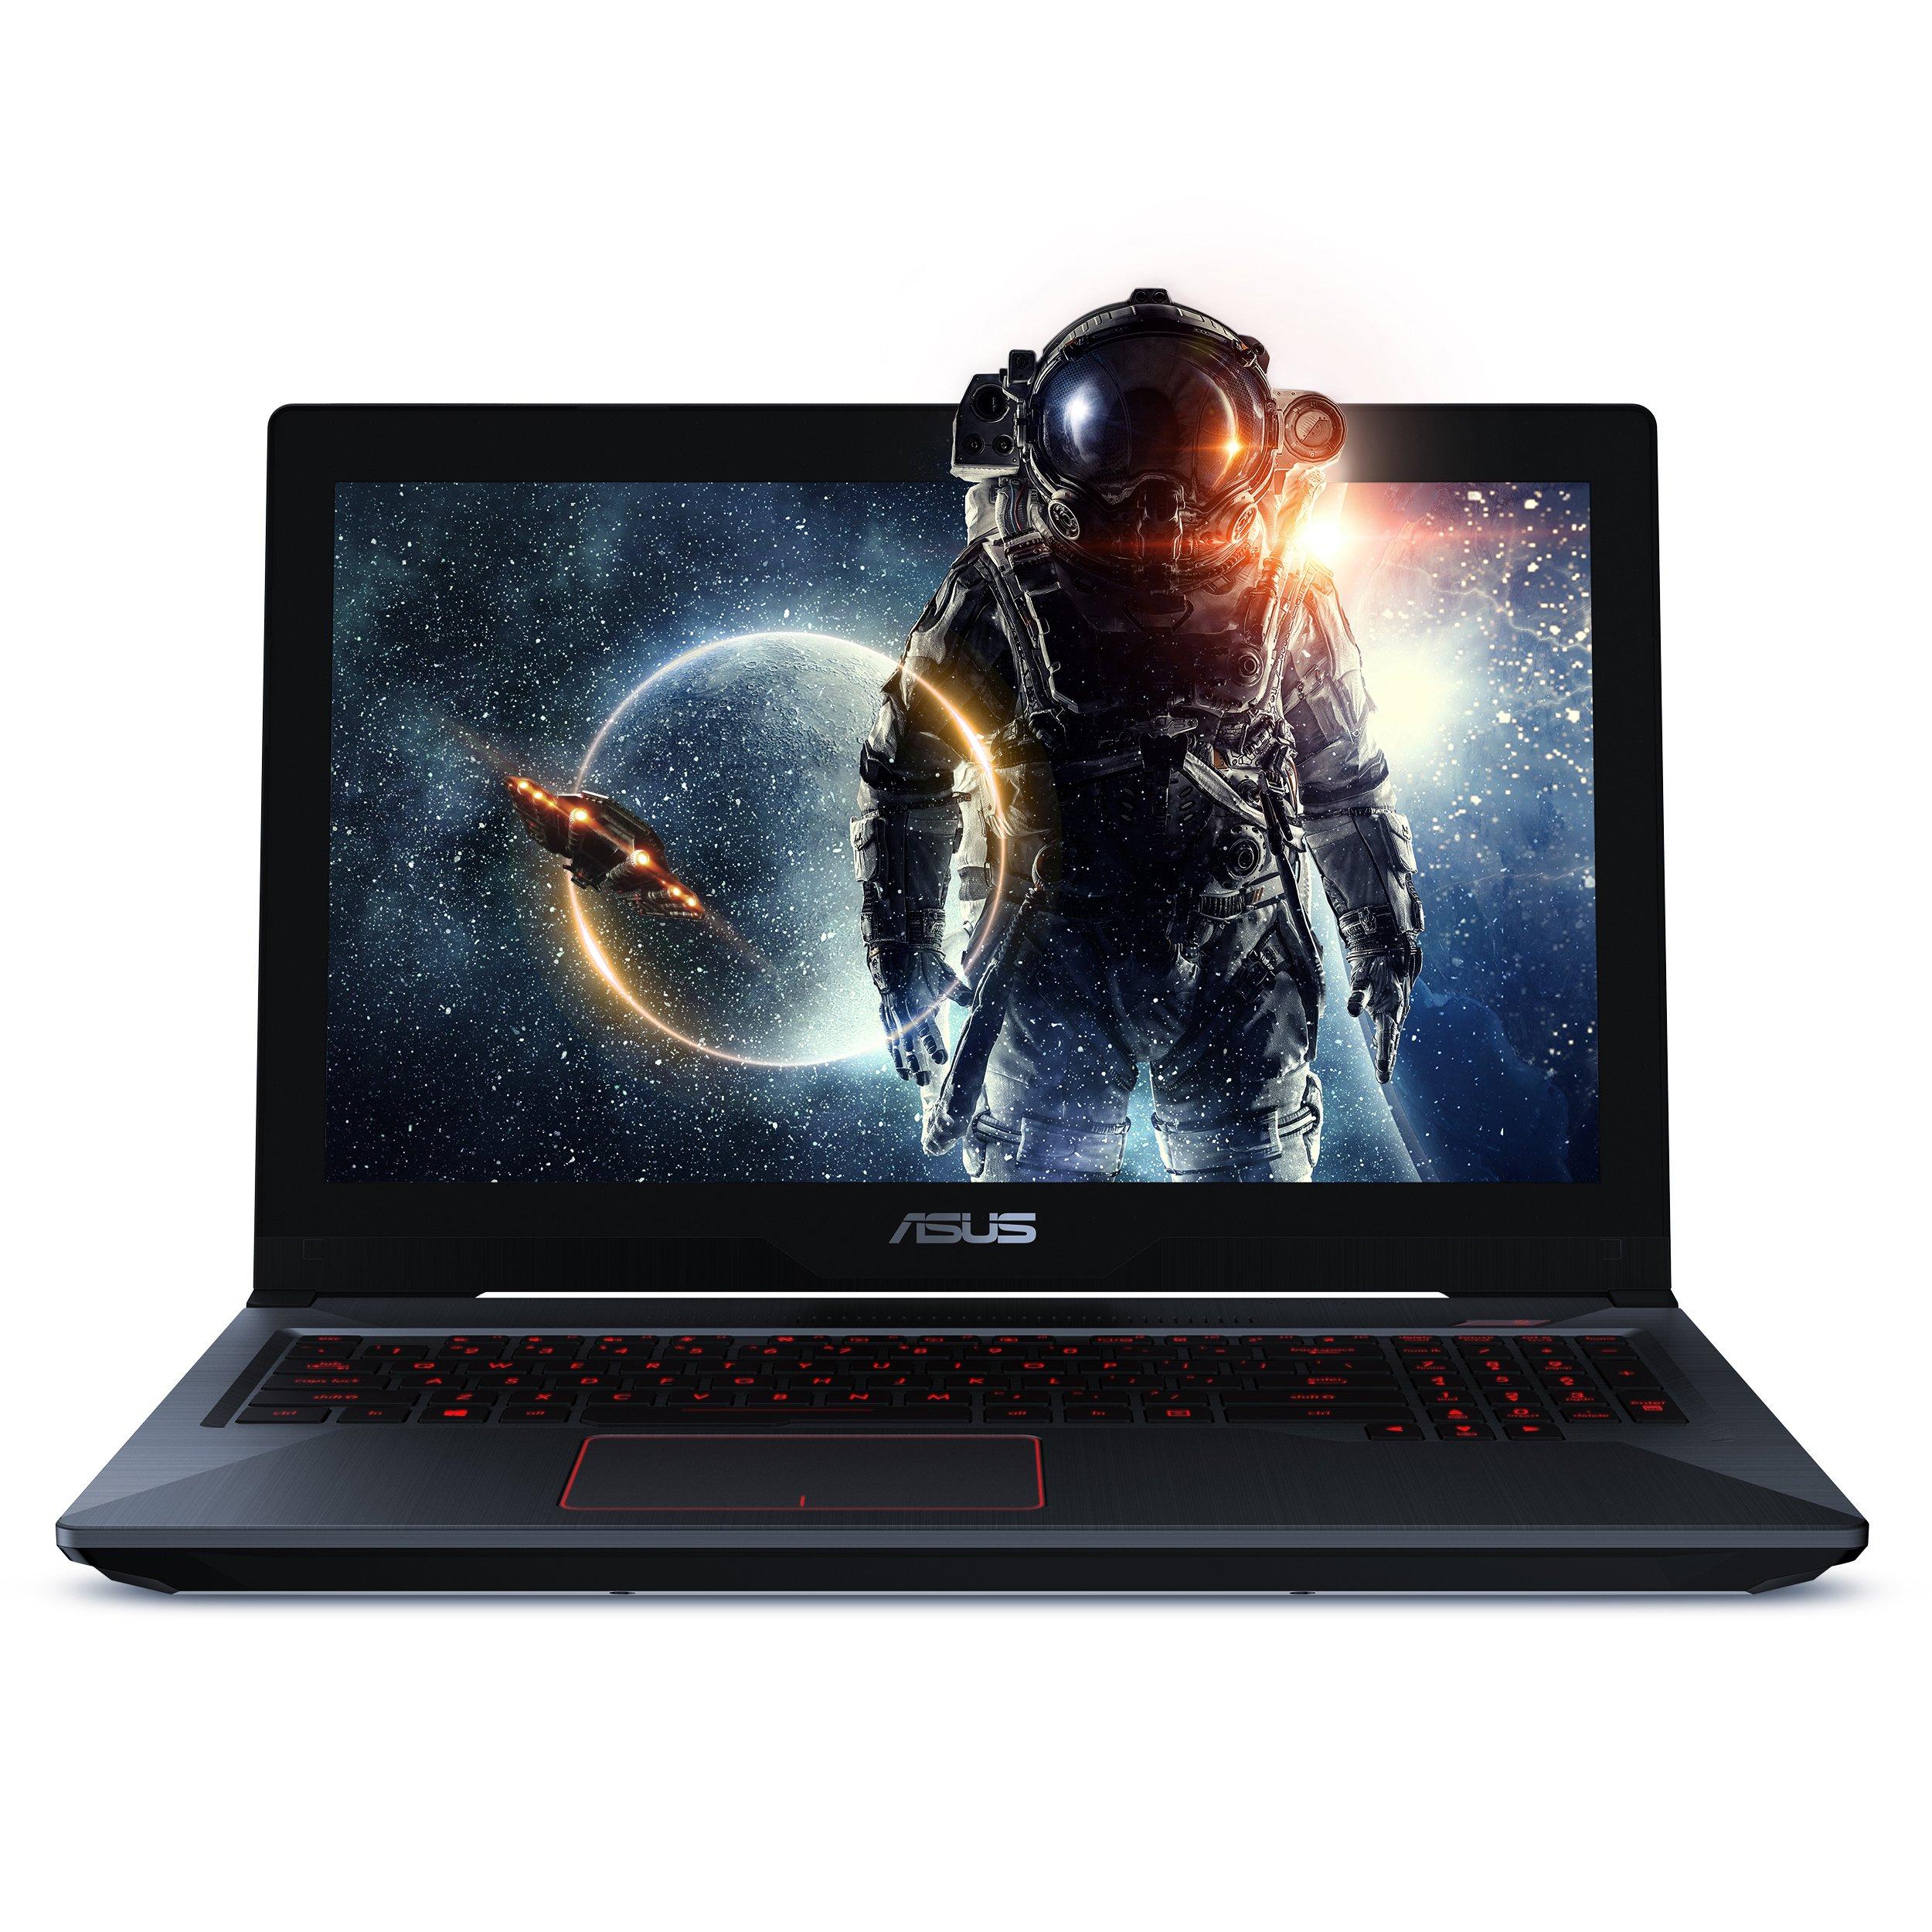 "ASUS FX503VM 15.6"" FHD Powerful Gaming Laptop, Intel Core i7-7700HQ Quad-Core 2.8GHz (Turbo up to 3.8GHz), 3GB GTX 1060, 128GB SSD + 1TB HDD, 16GB DDR4, Windows 10"